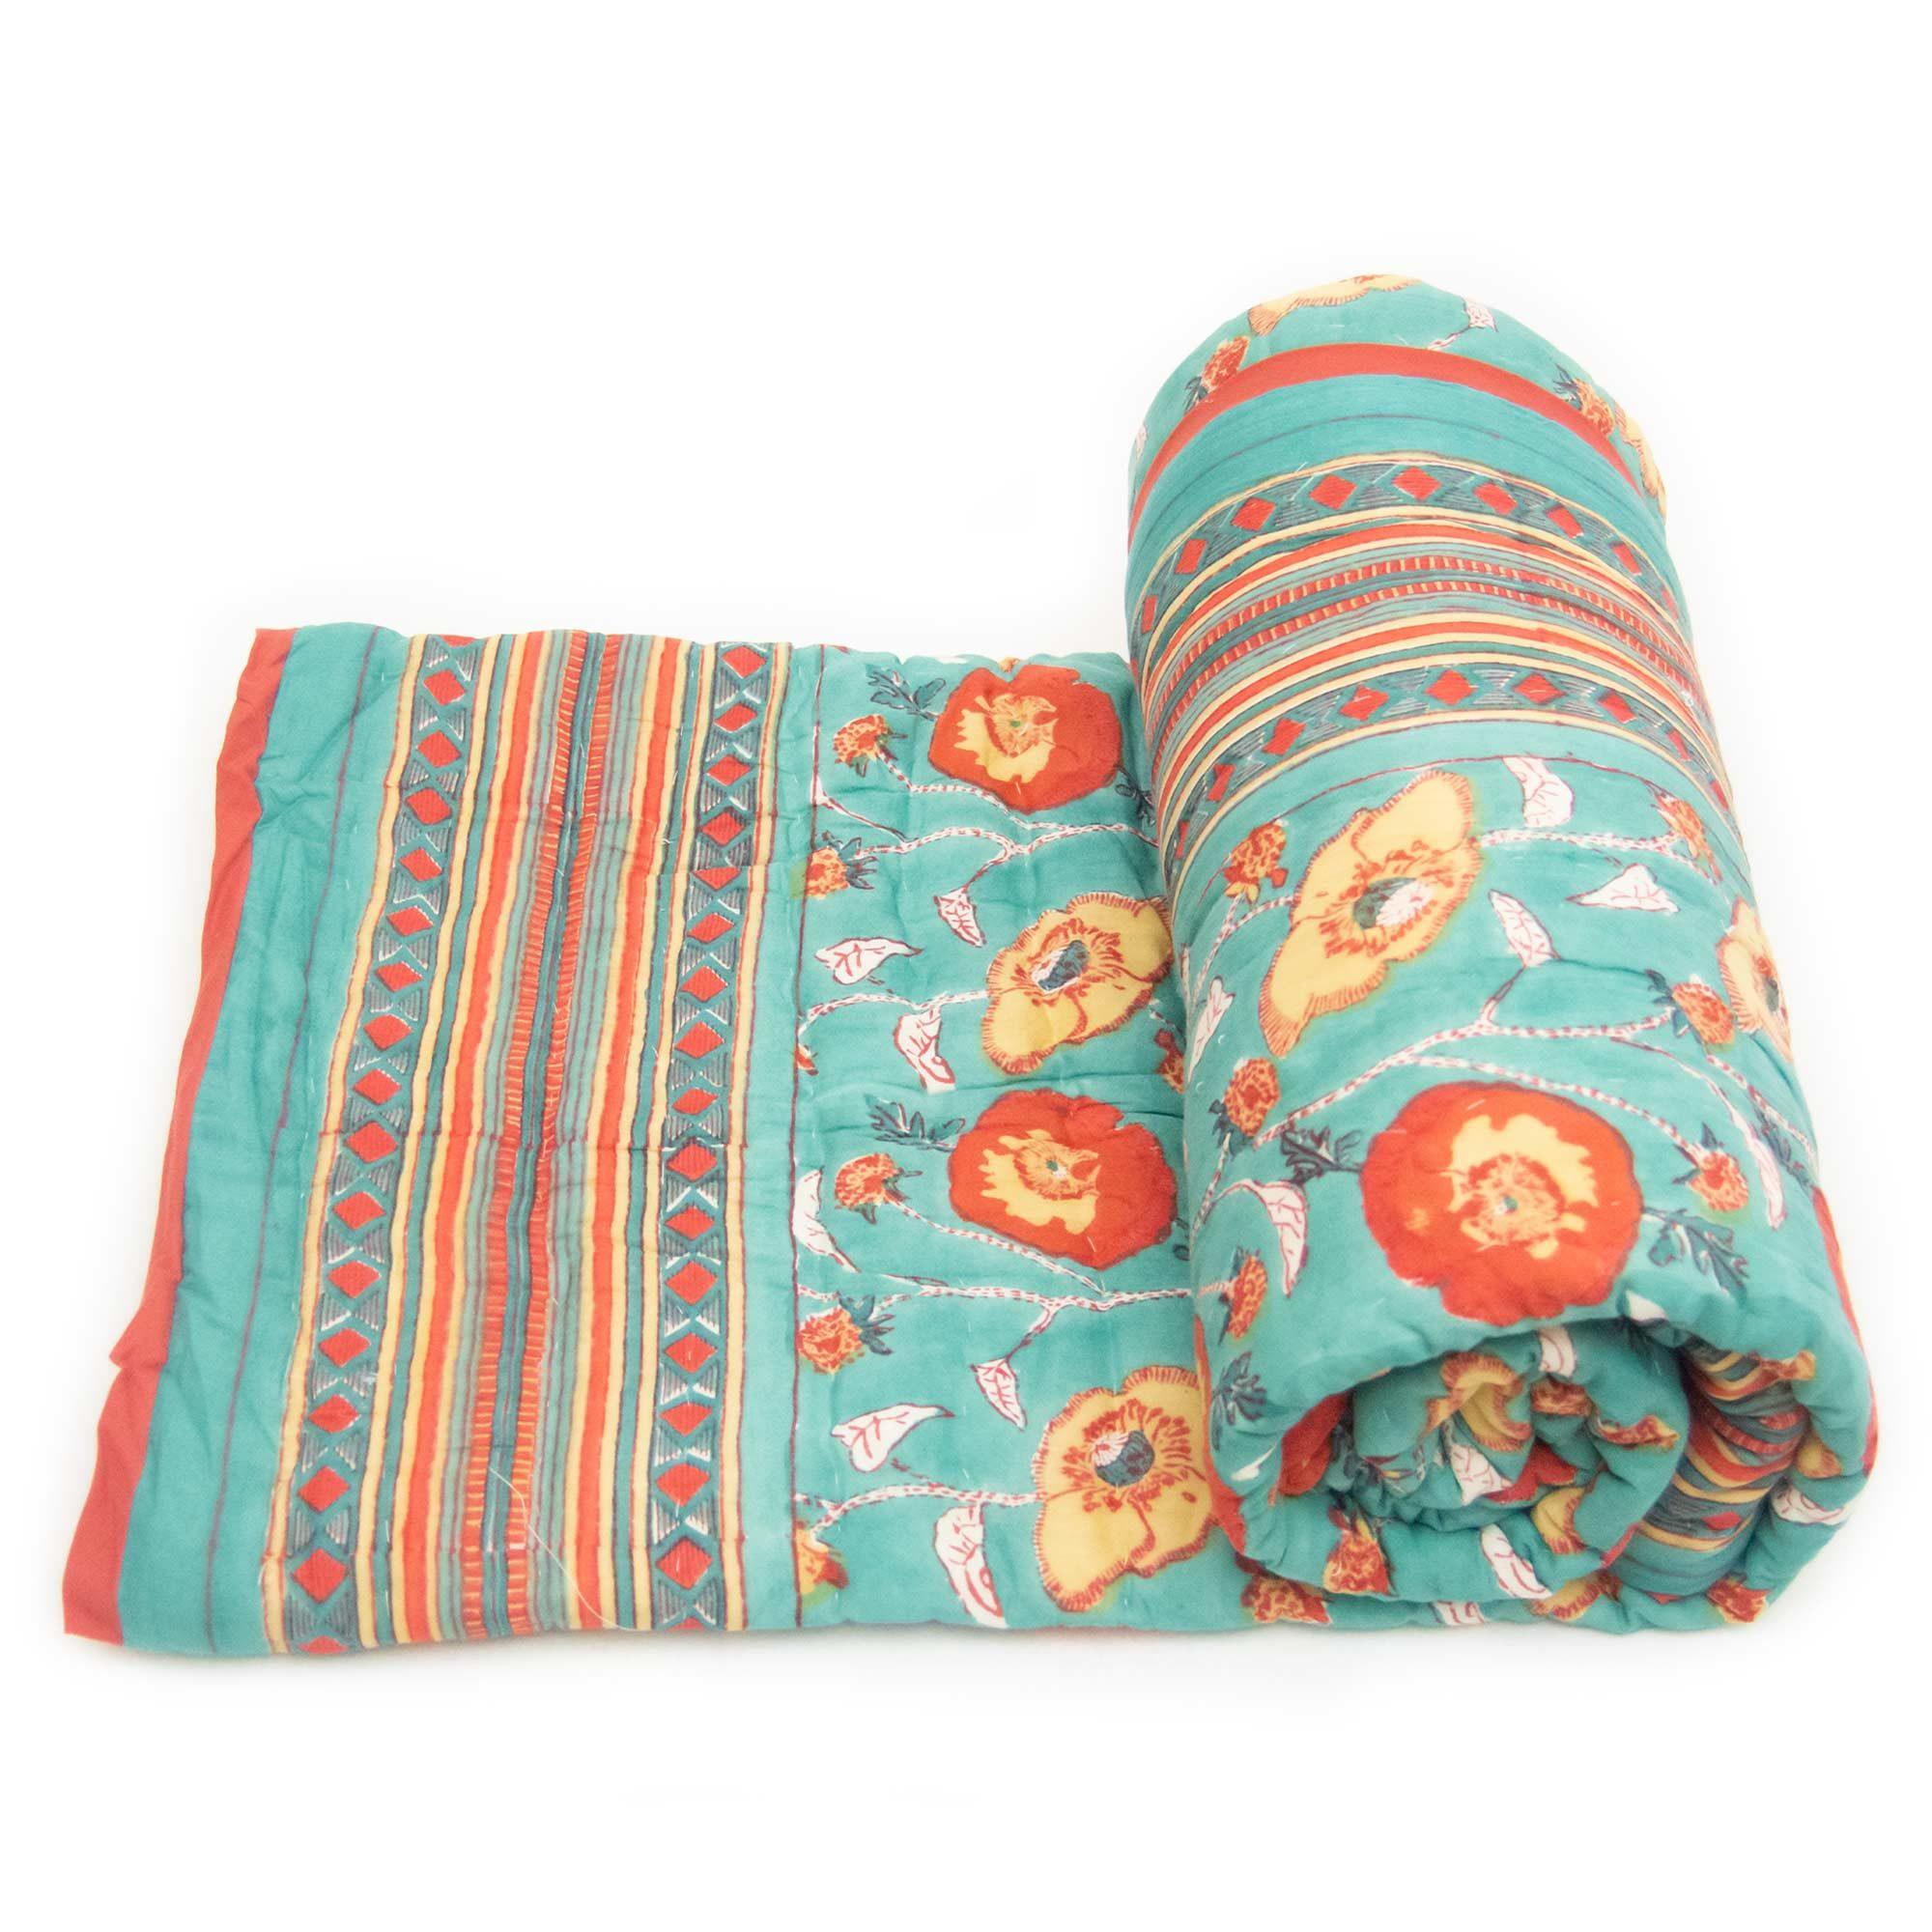 Tara-Textile - indische Decke - Kuscheldecke Isha